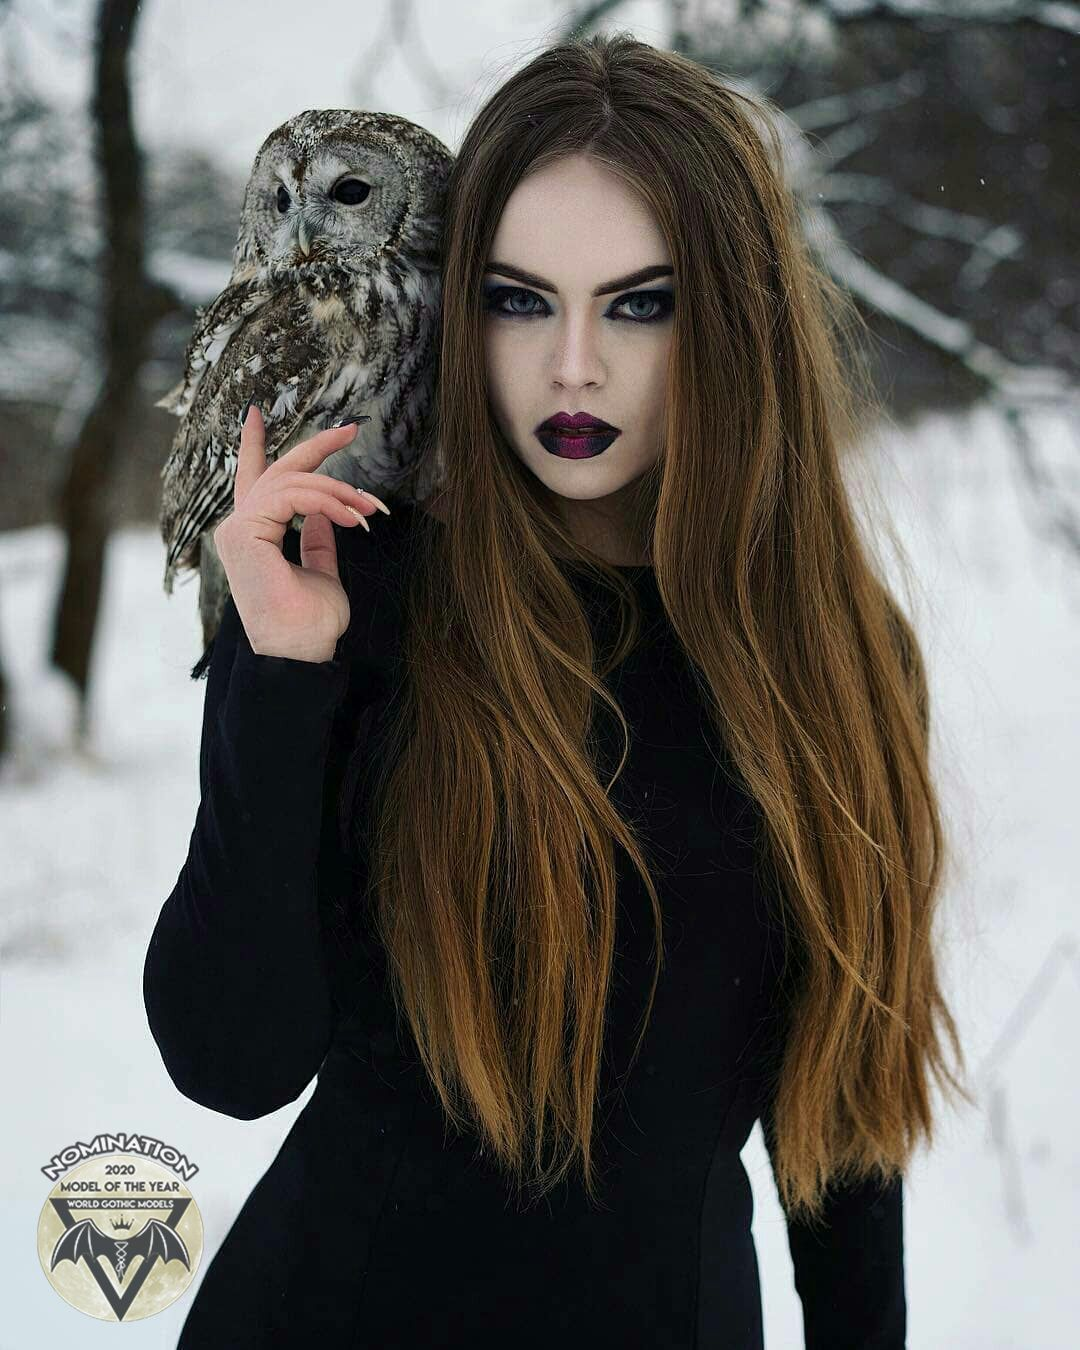 25. @tanya_bright, Russia